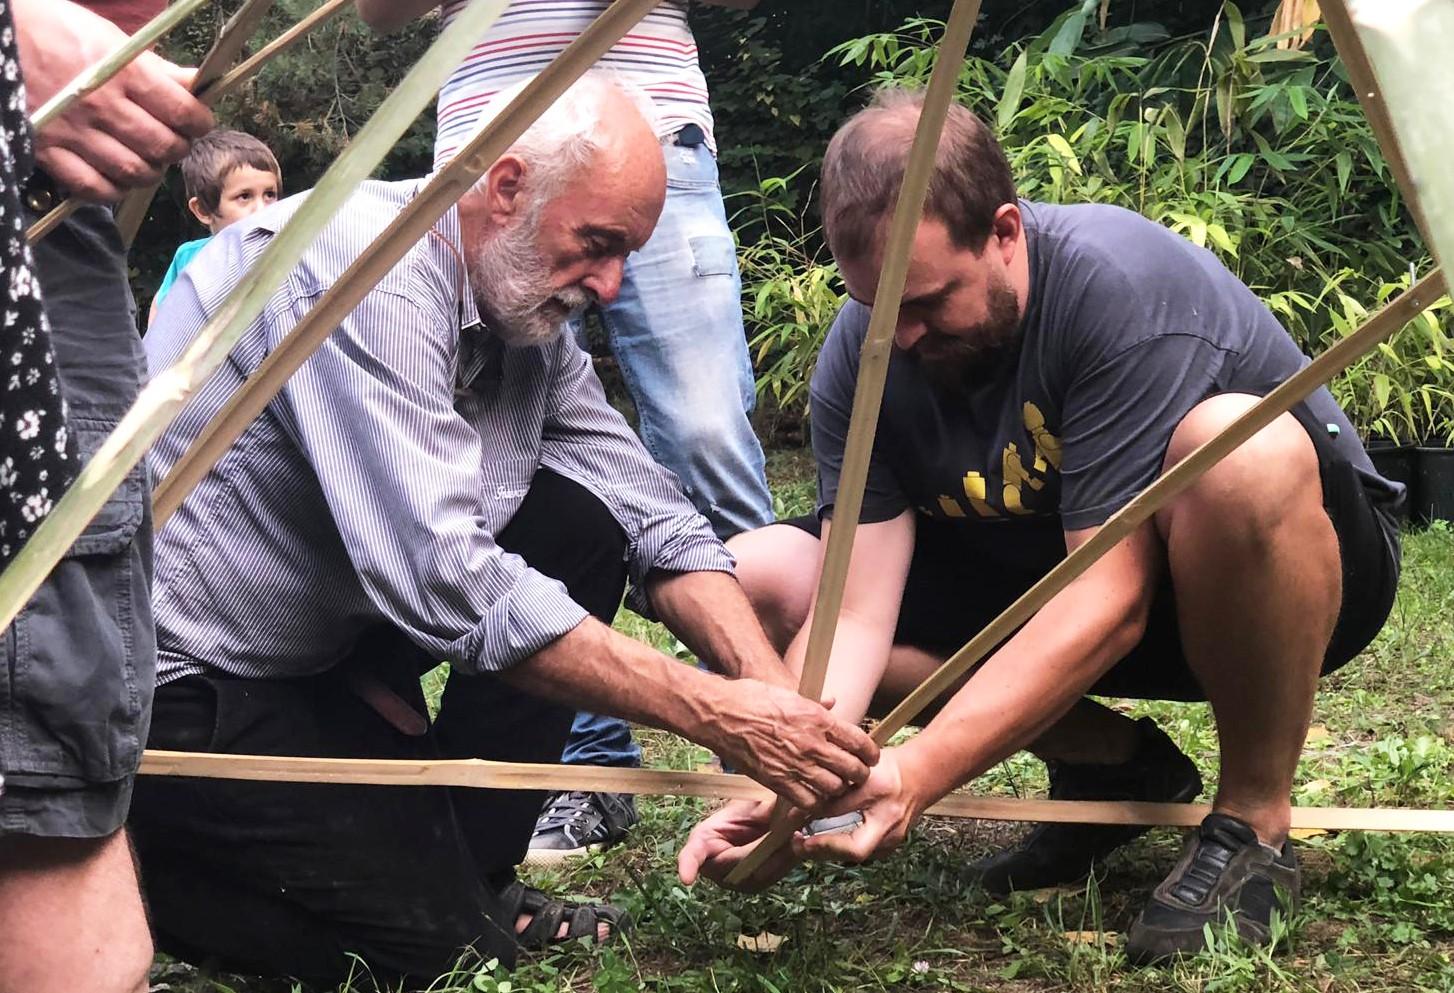 bambu pianta futuro nuova economia 1568274393